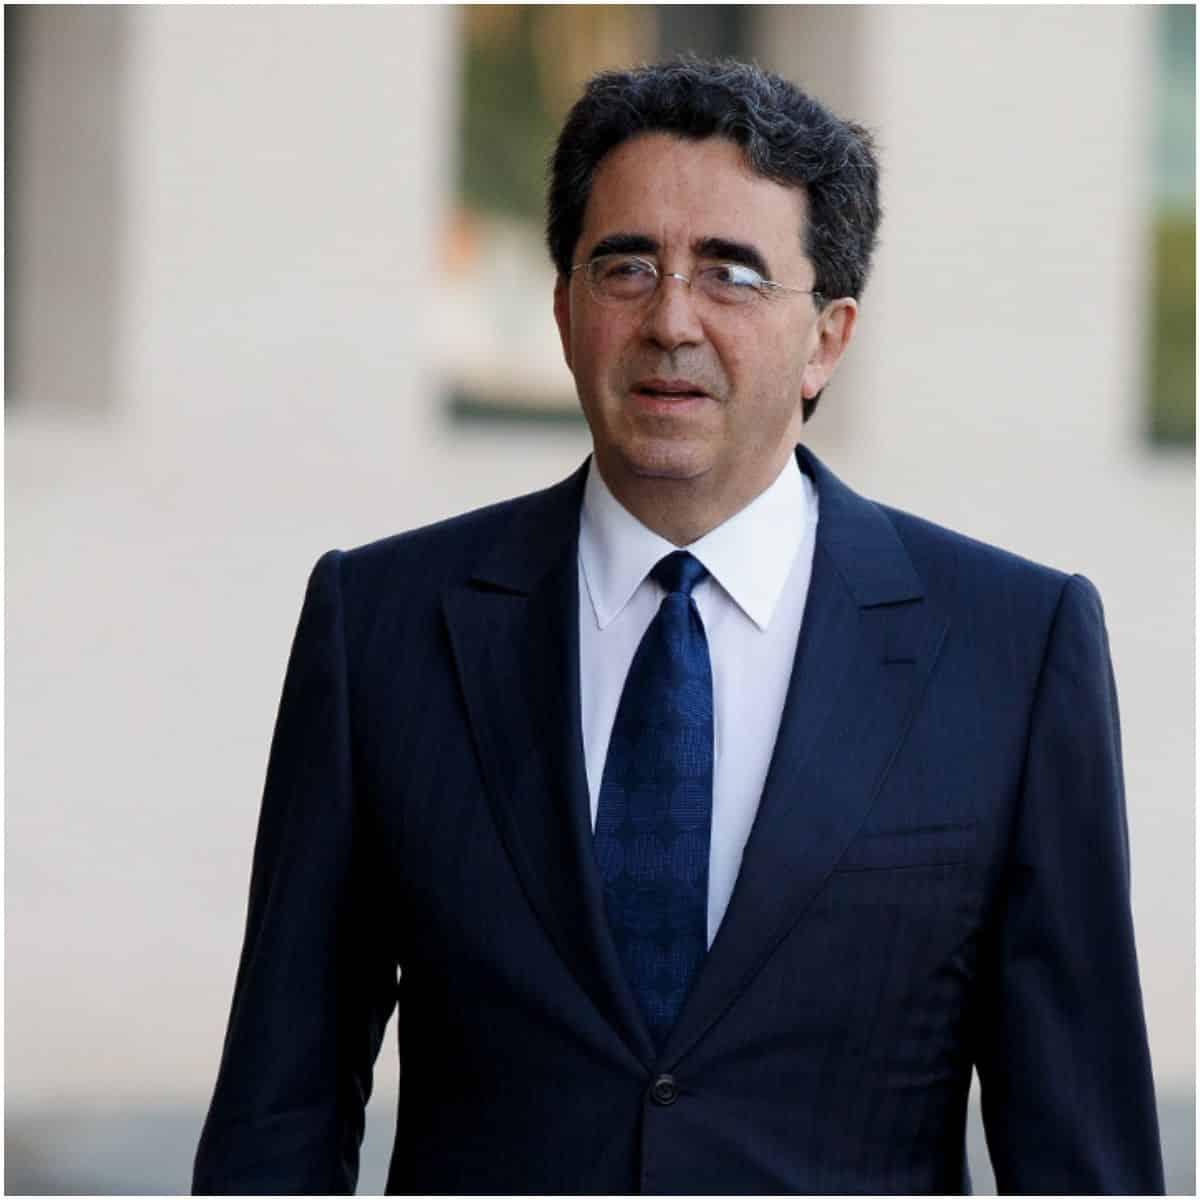 what is the net worth of Santiago Calatrava